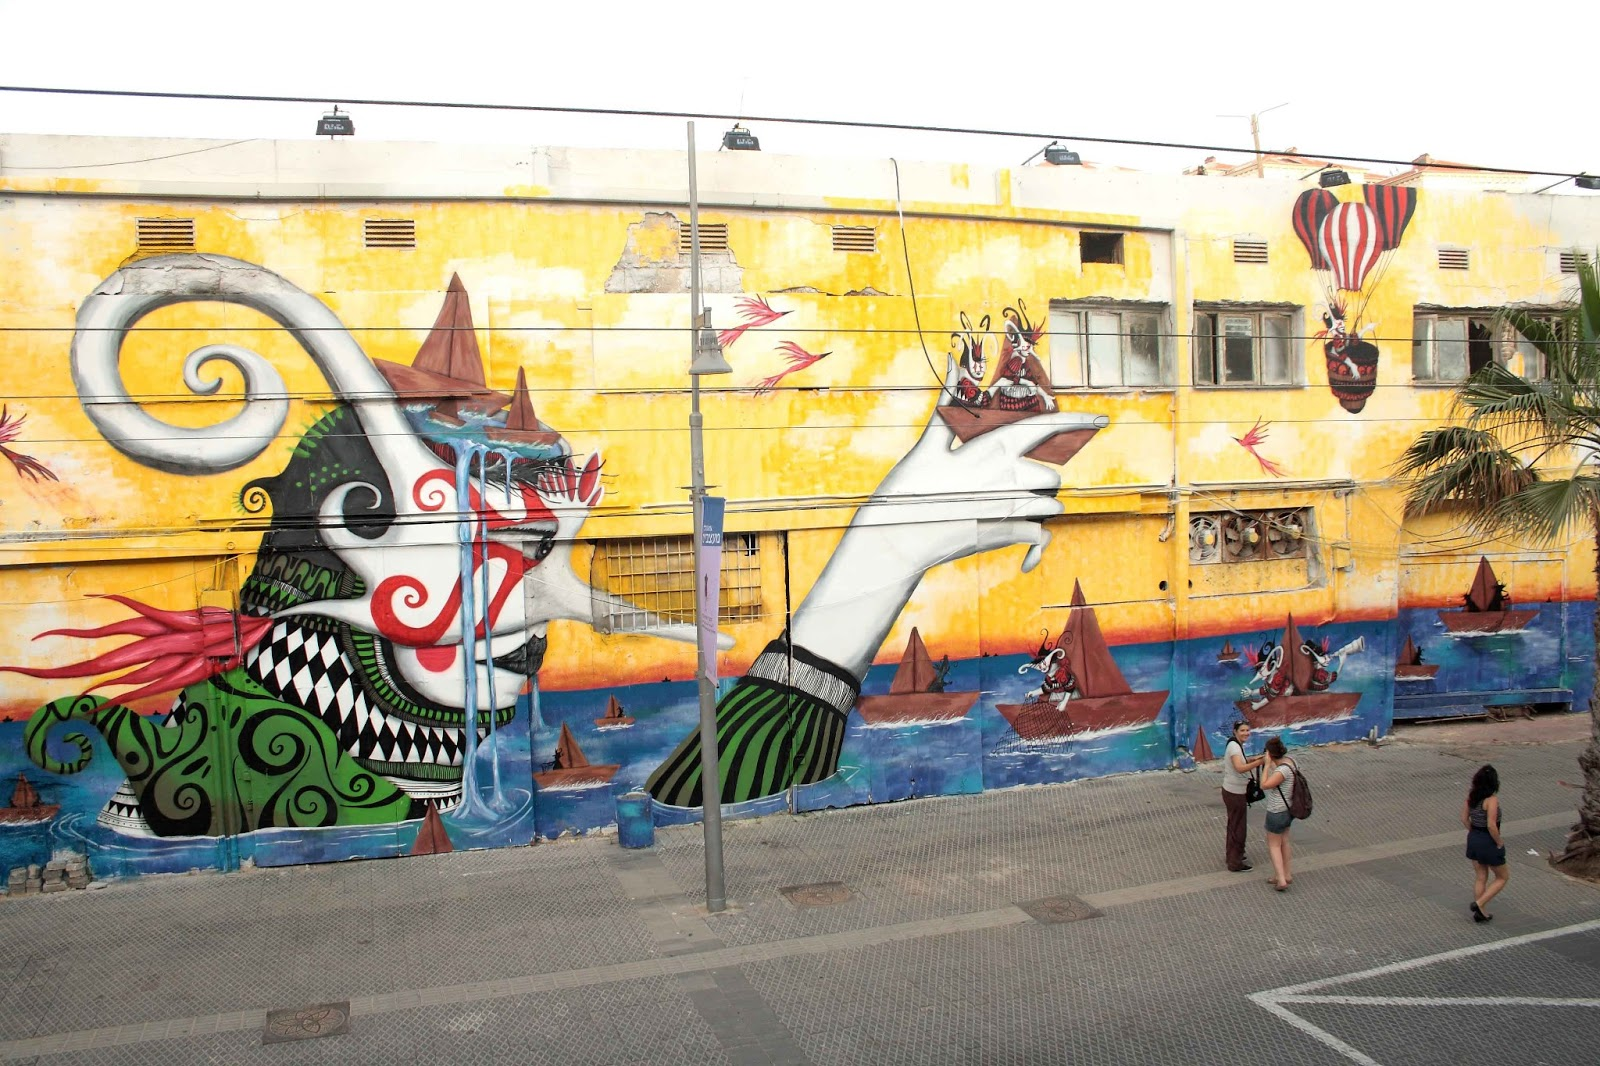 Vimural: The Viral Mural Home to Street Artist Biographies: Skount ...